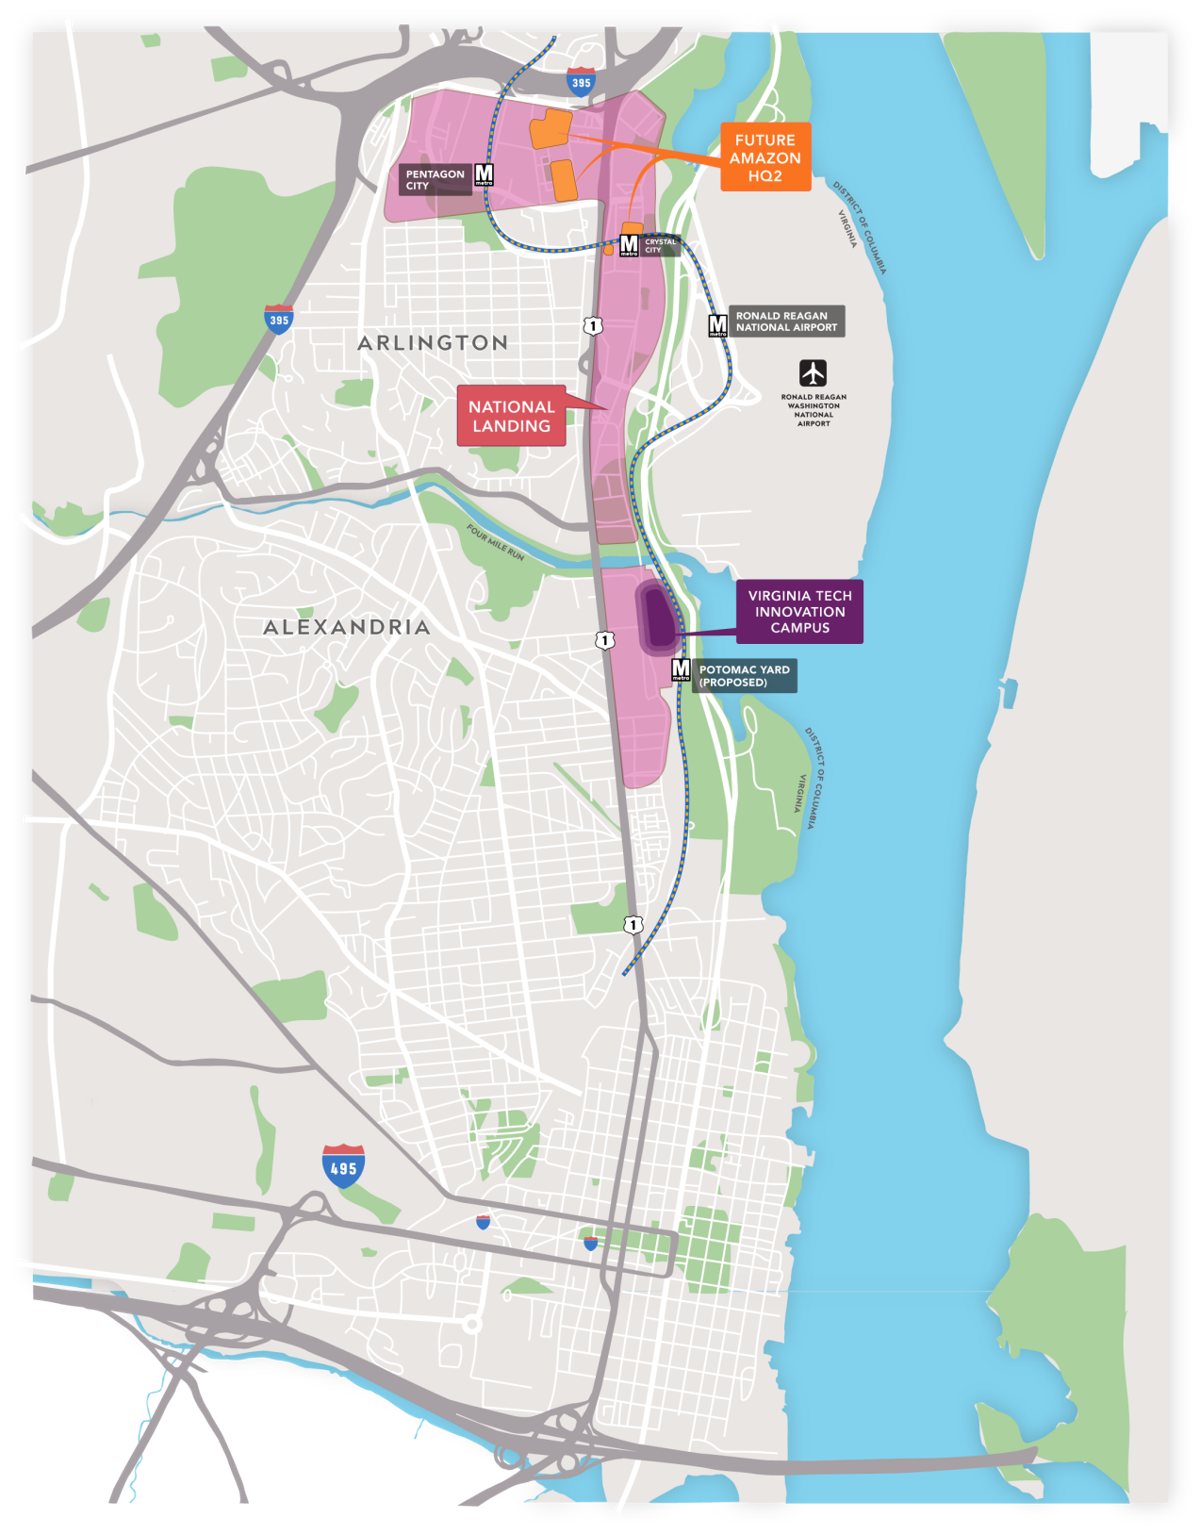 Innovation Campus map